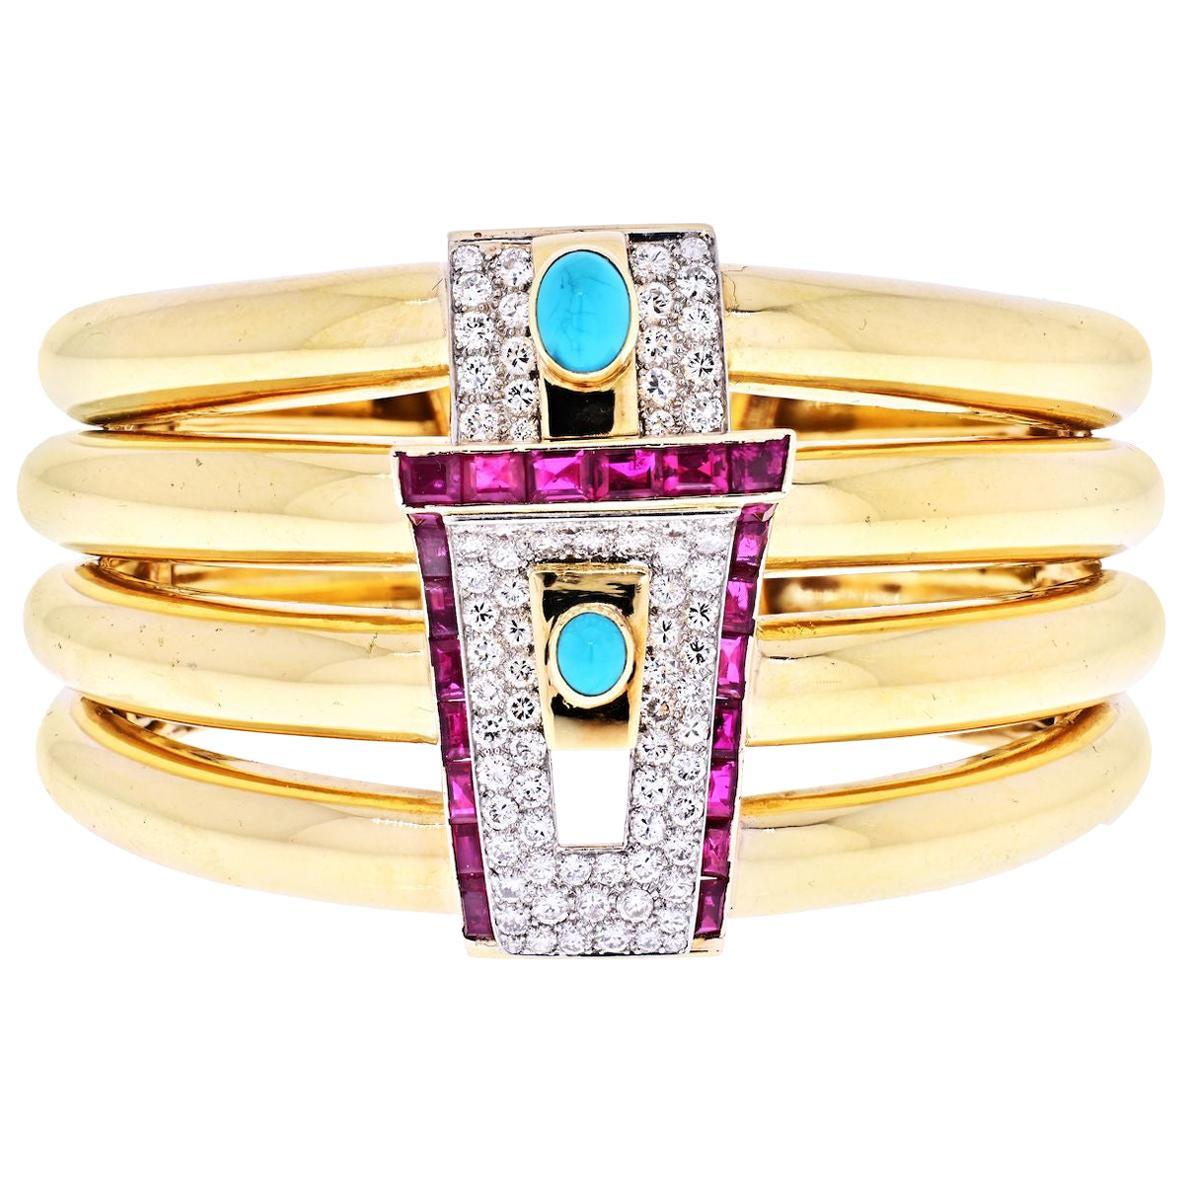 David Webb Yellow Gold Diamond, Ruby and Turquoise Cuff Bracelet